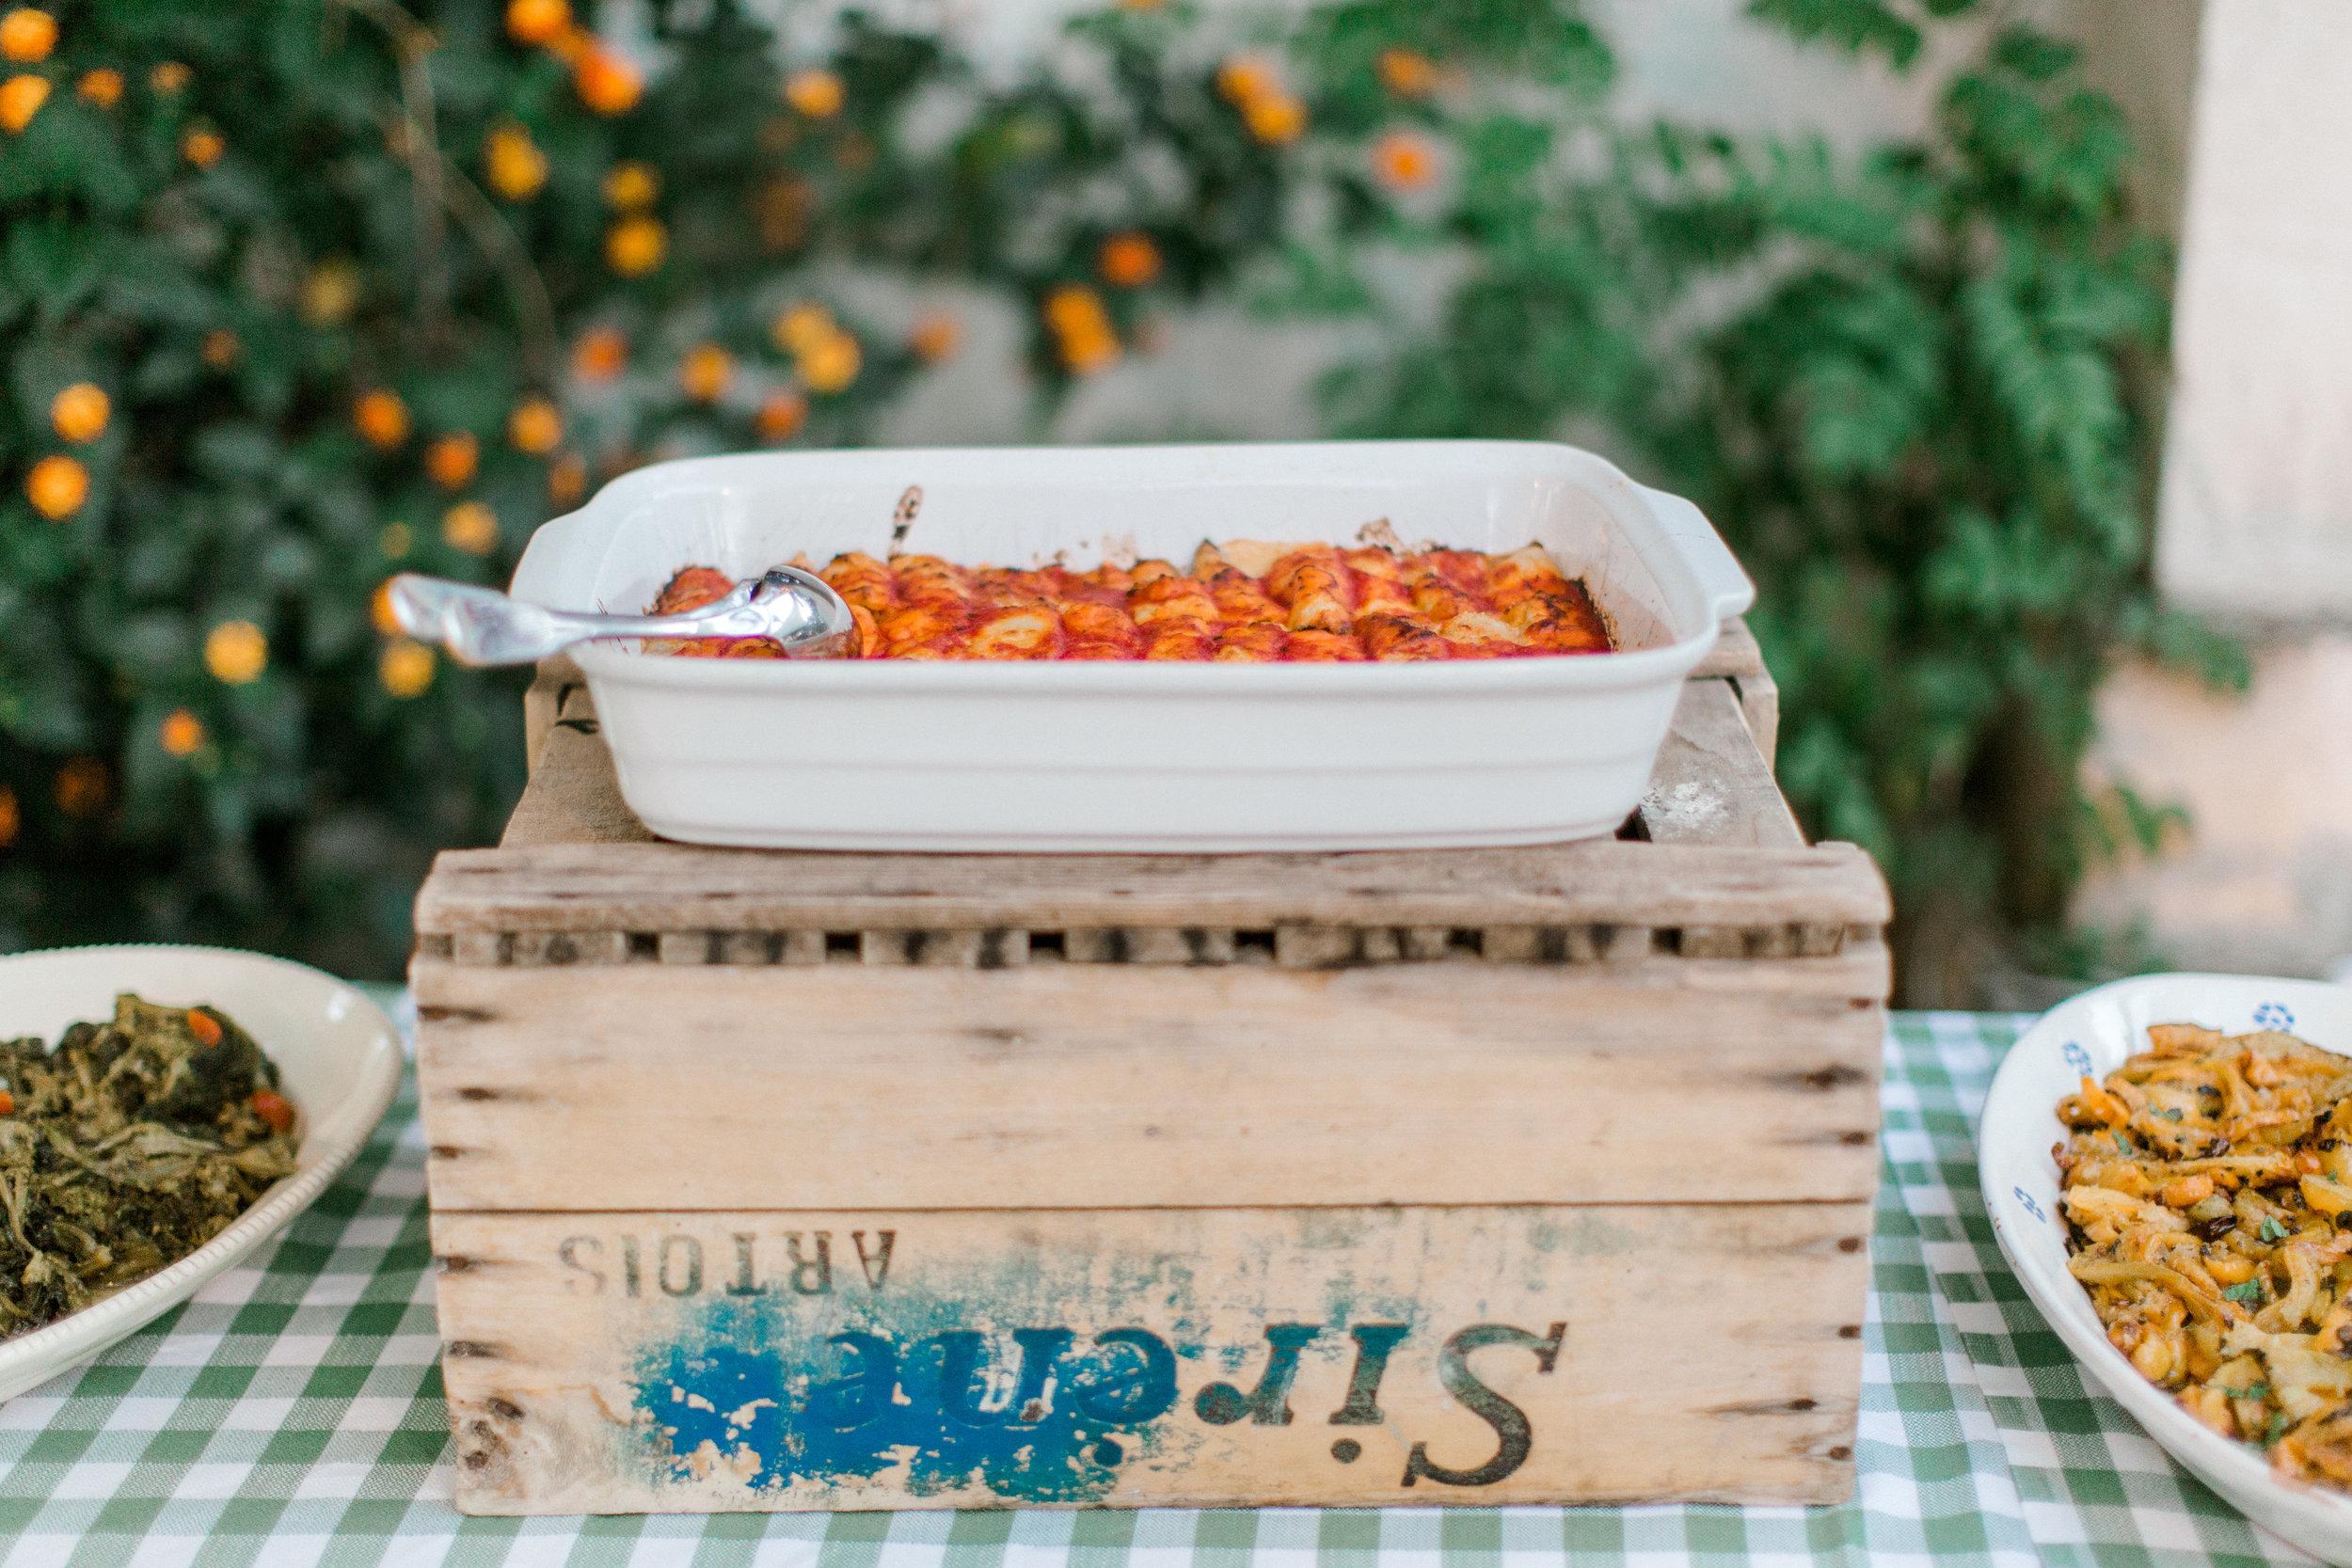 Fresh Puglian food - Italian destination wedding planned by Meggie Francisco Events, photographed by Tracy Enoch, film by Innar Hunt